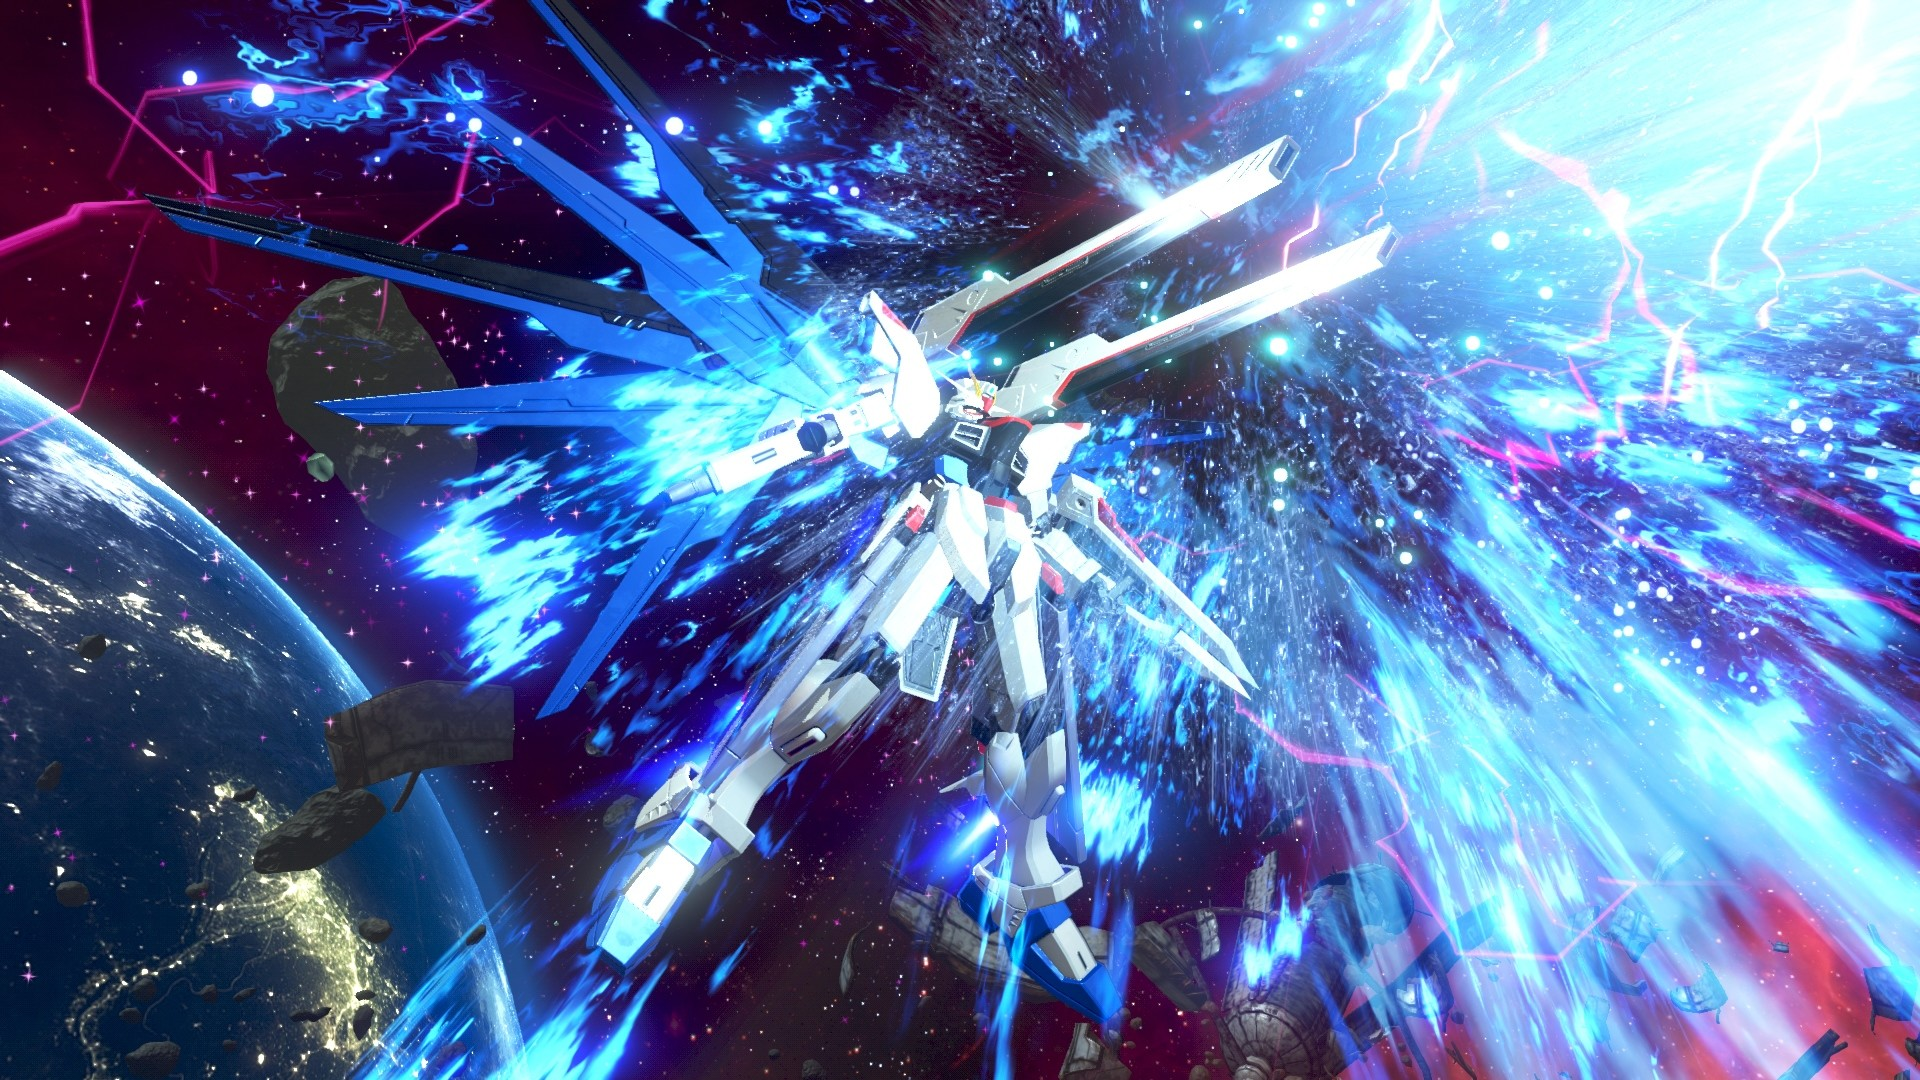 Awesome Gundam Versus PlayStation 4 (PS4) Game wallpaper